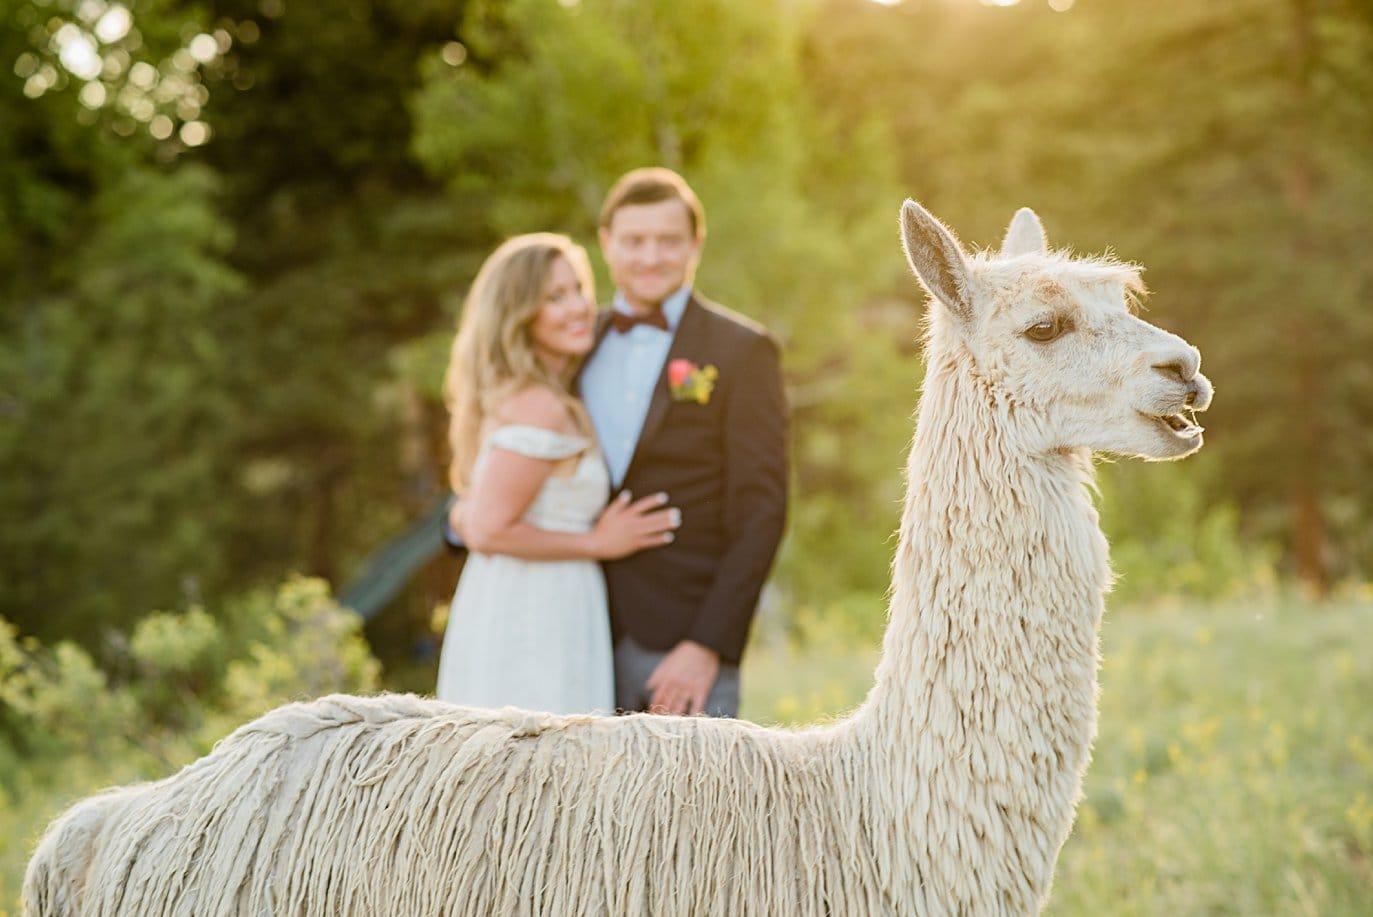 alpaca wedding day photobomb at Golden elopement by Golden elopement photographer Jennie Crate